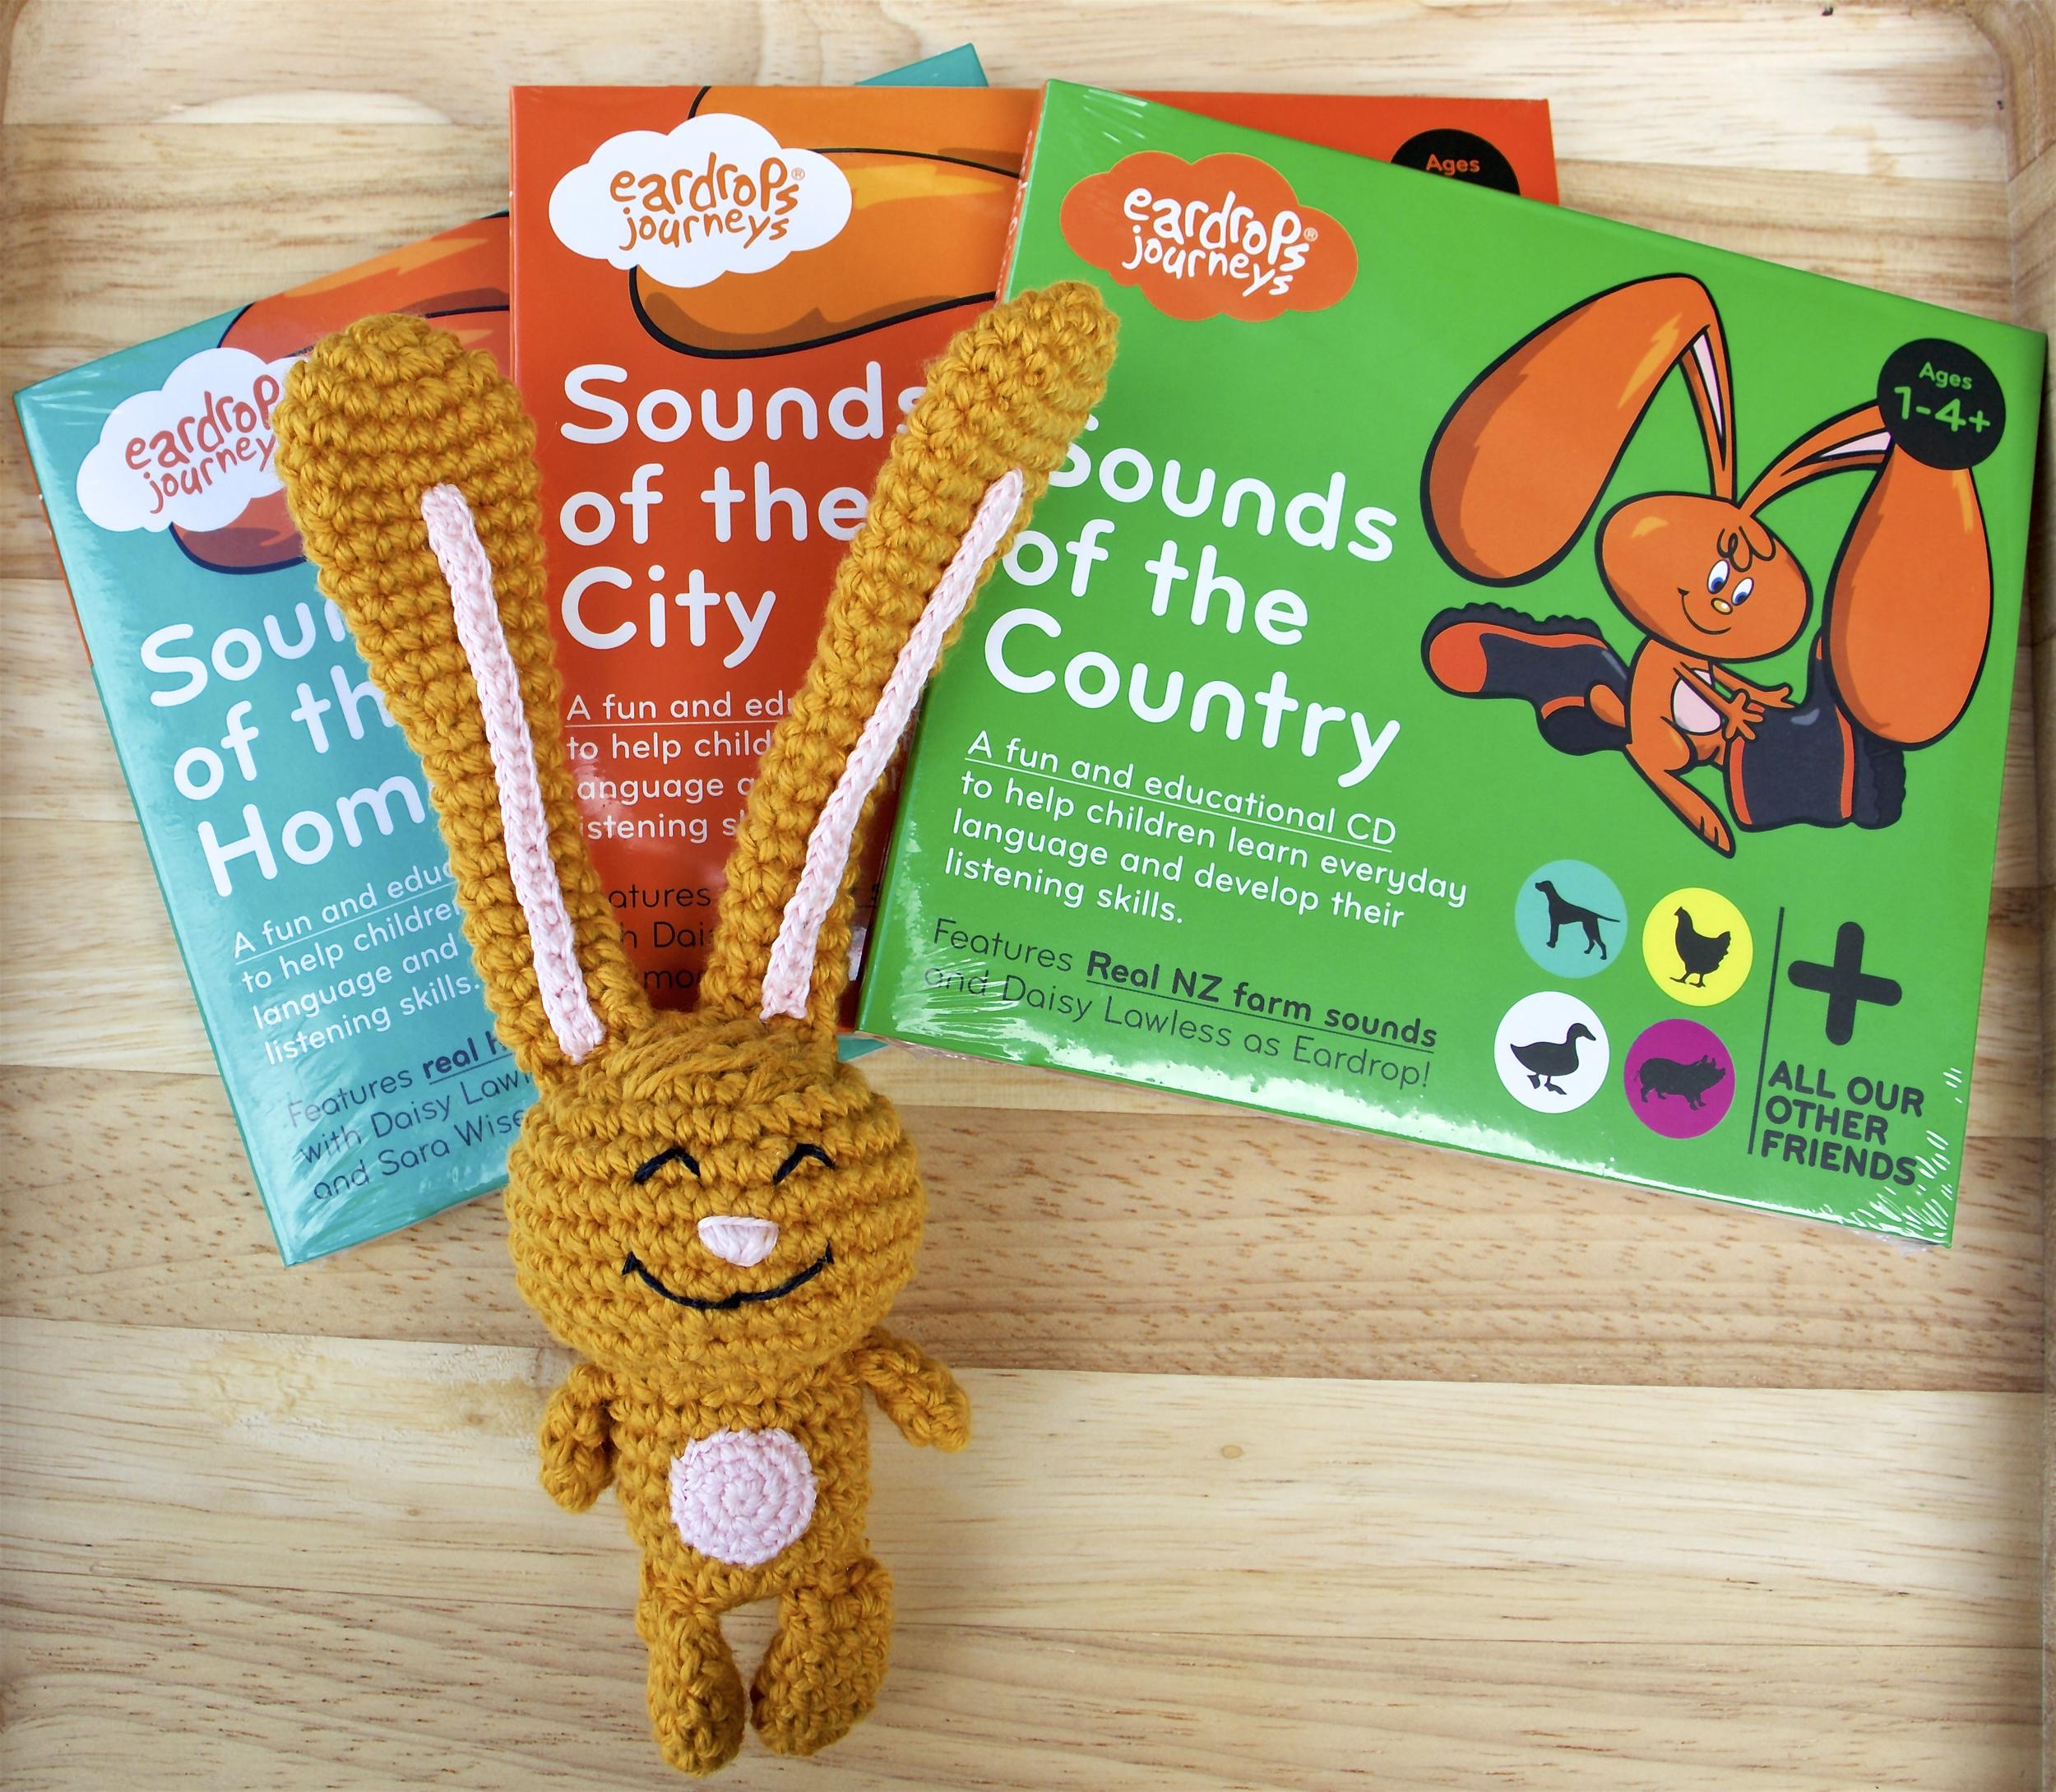 Toddler Talk giveaway